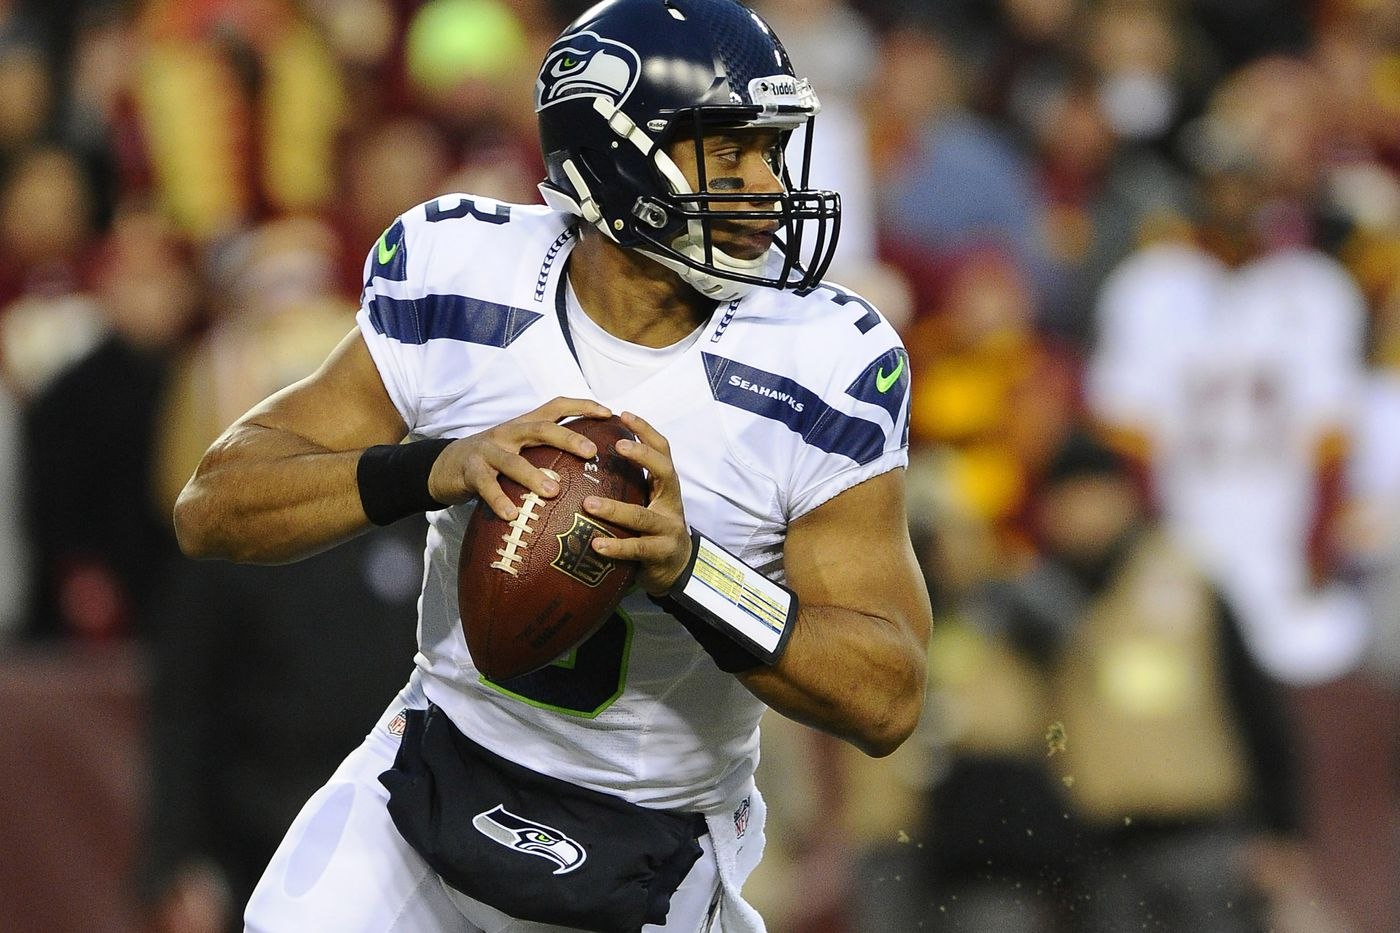 Seahawks beat Redskins, prepare for Falcons - Field Gulls